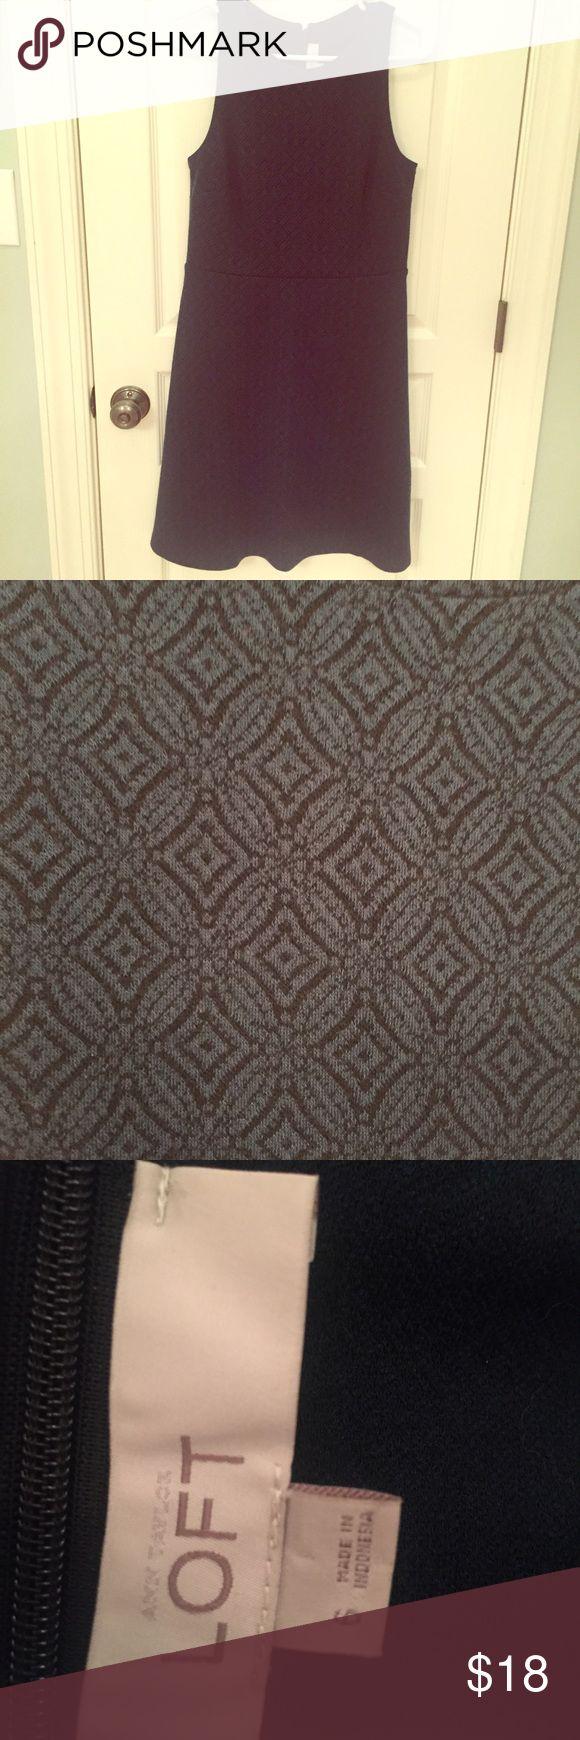 Loft dress size 6 Dark green with quilt like pattern. A-line. Size 6. Hidden zipper up the back. Very flattering. Worn once. Gorgeous! Smoke-free home. LOFT Dresses